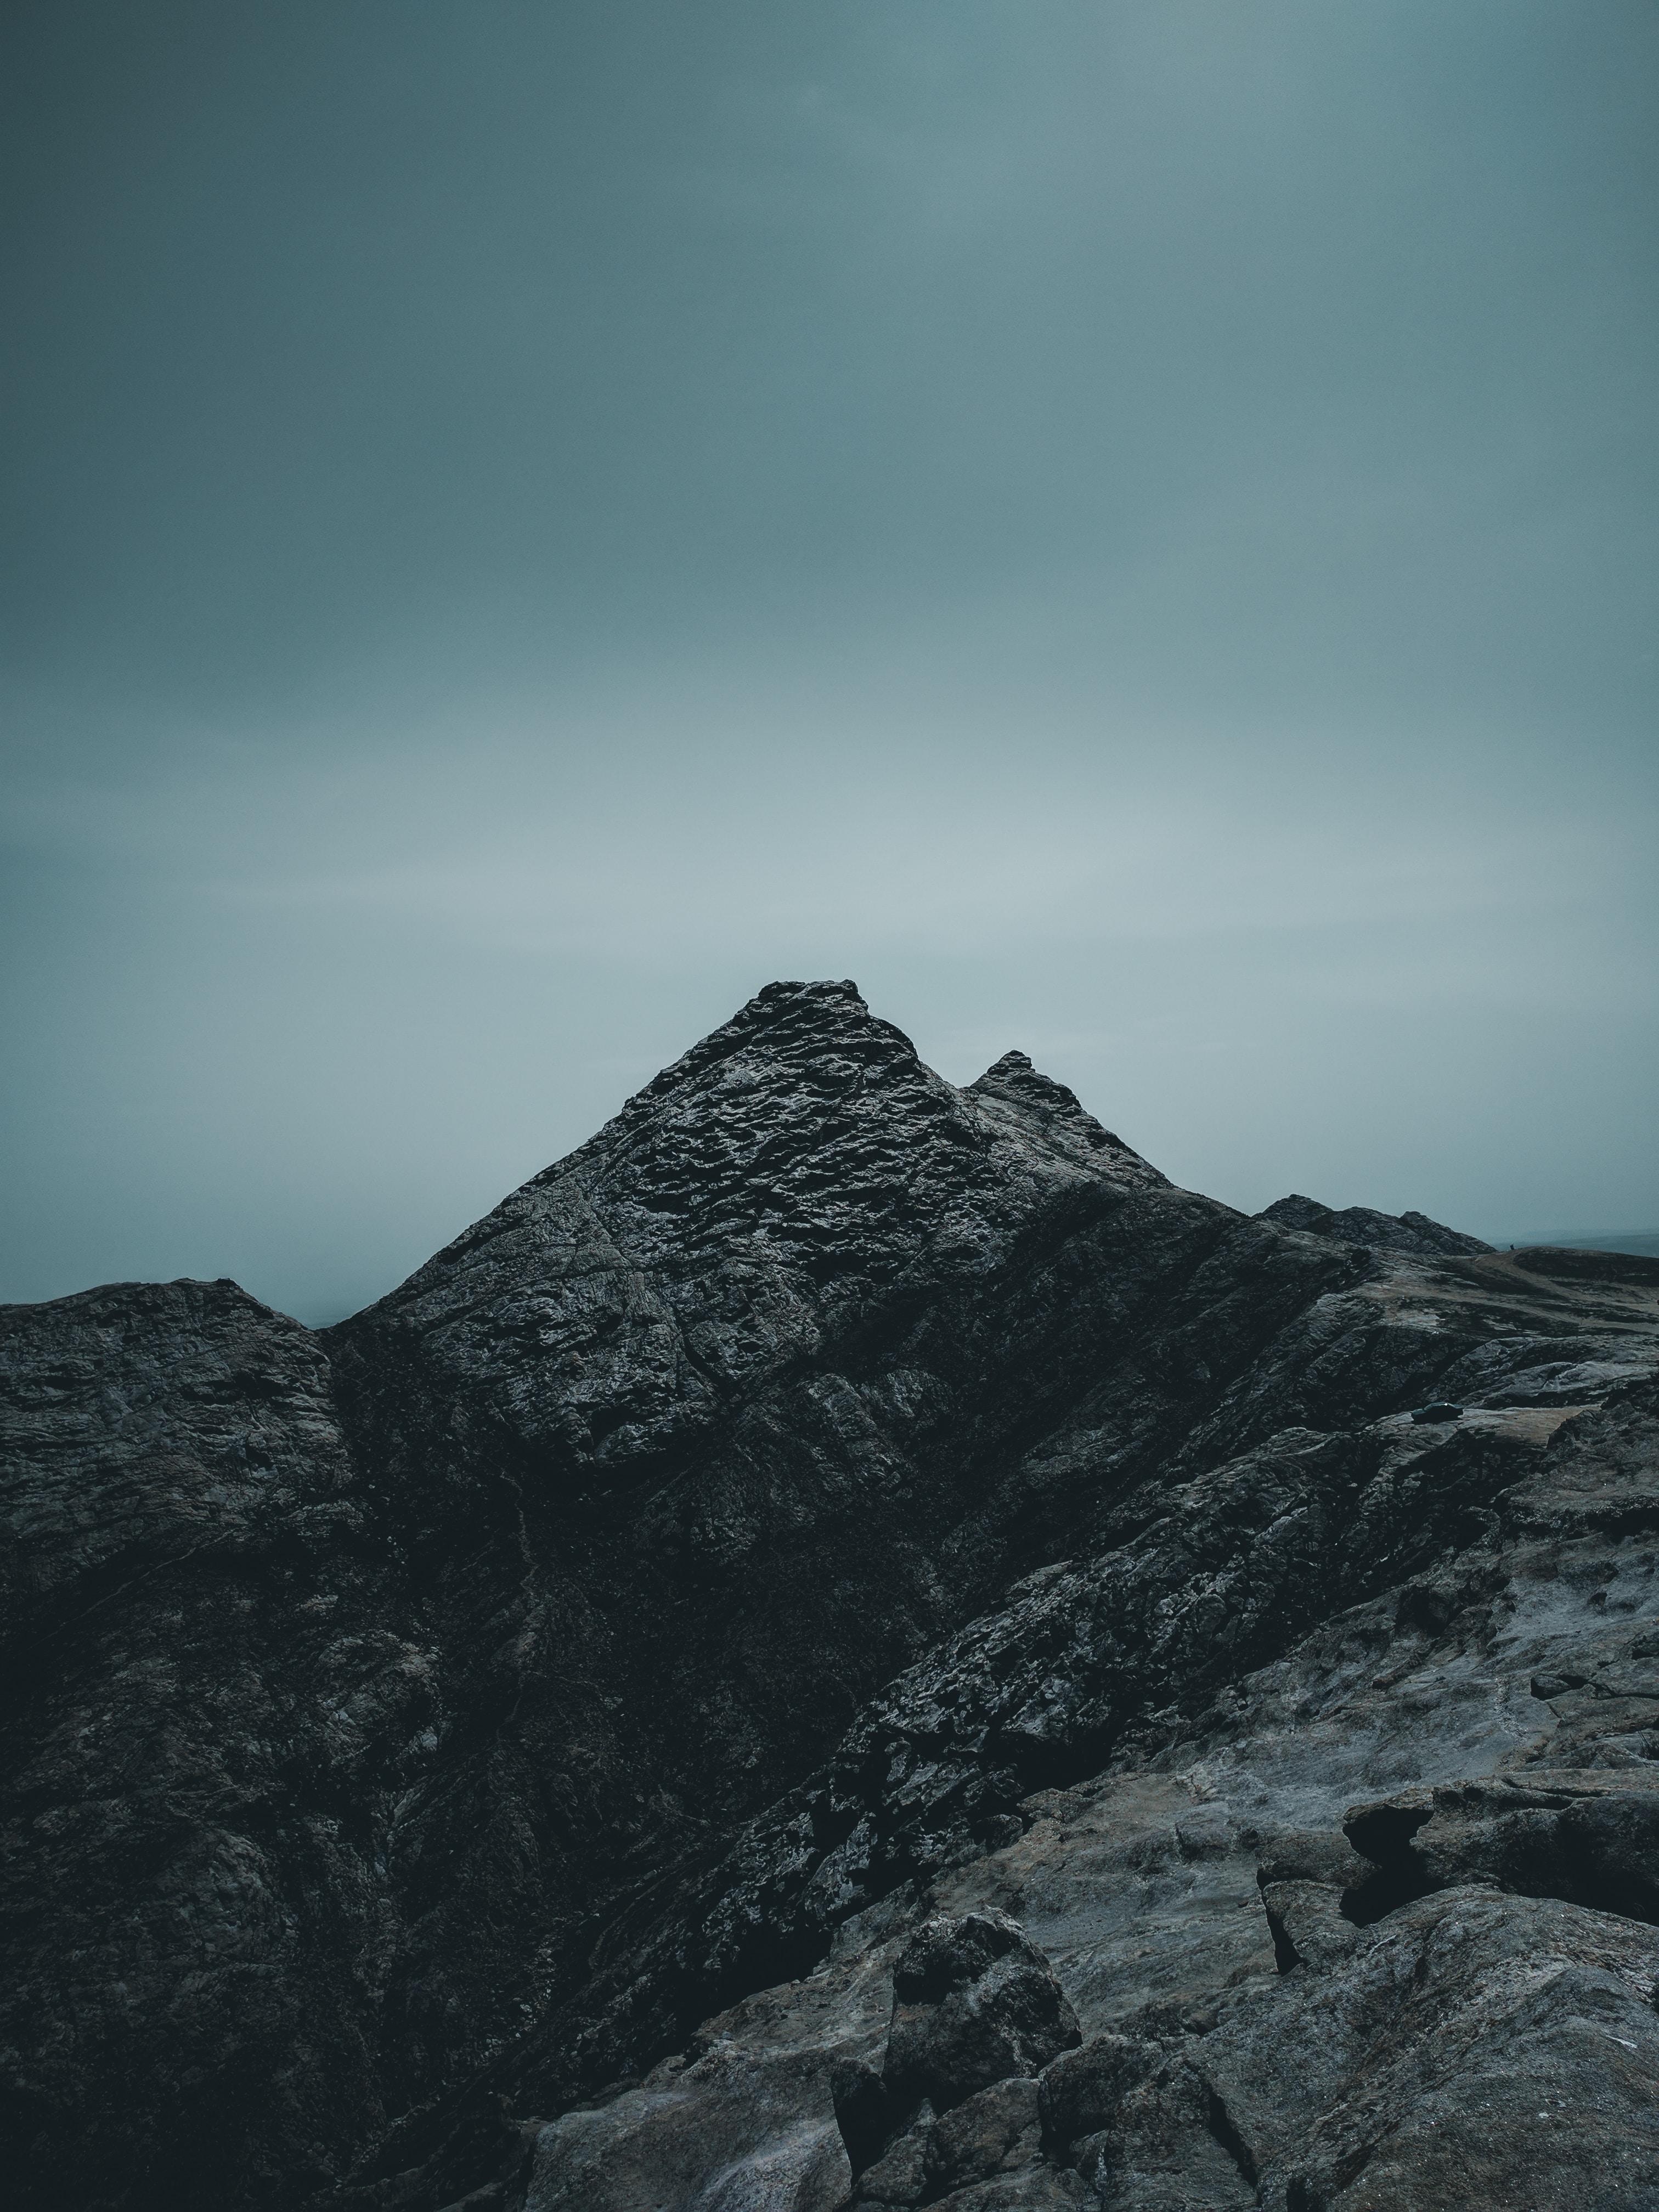 rock mountain under cloudy sky